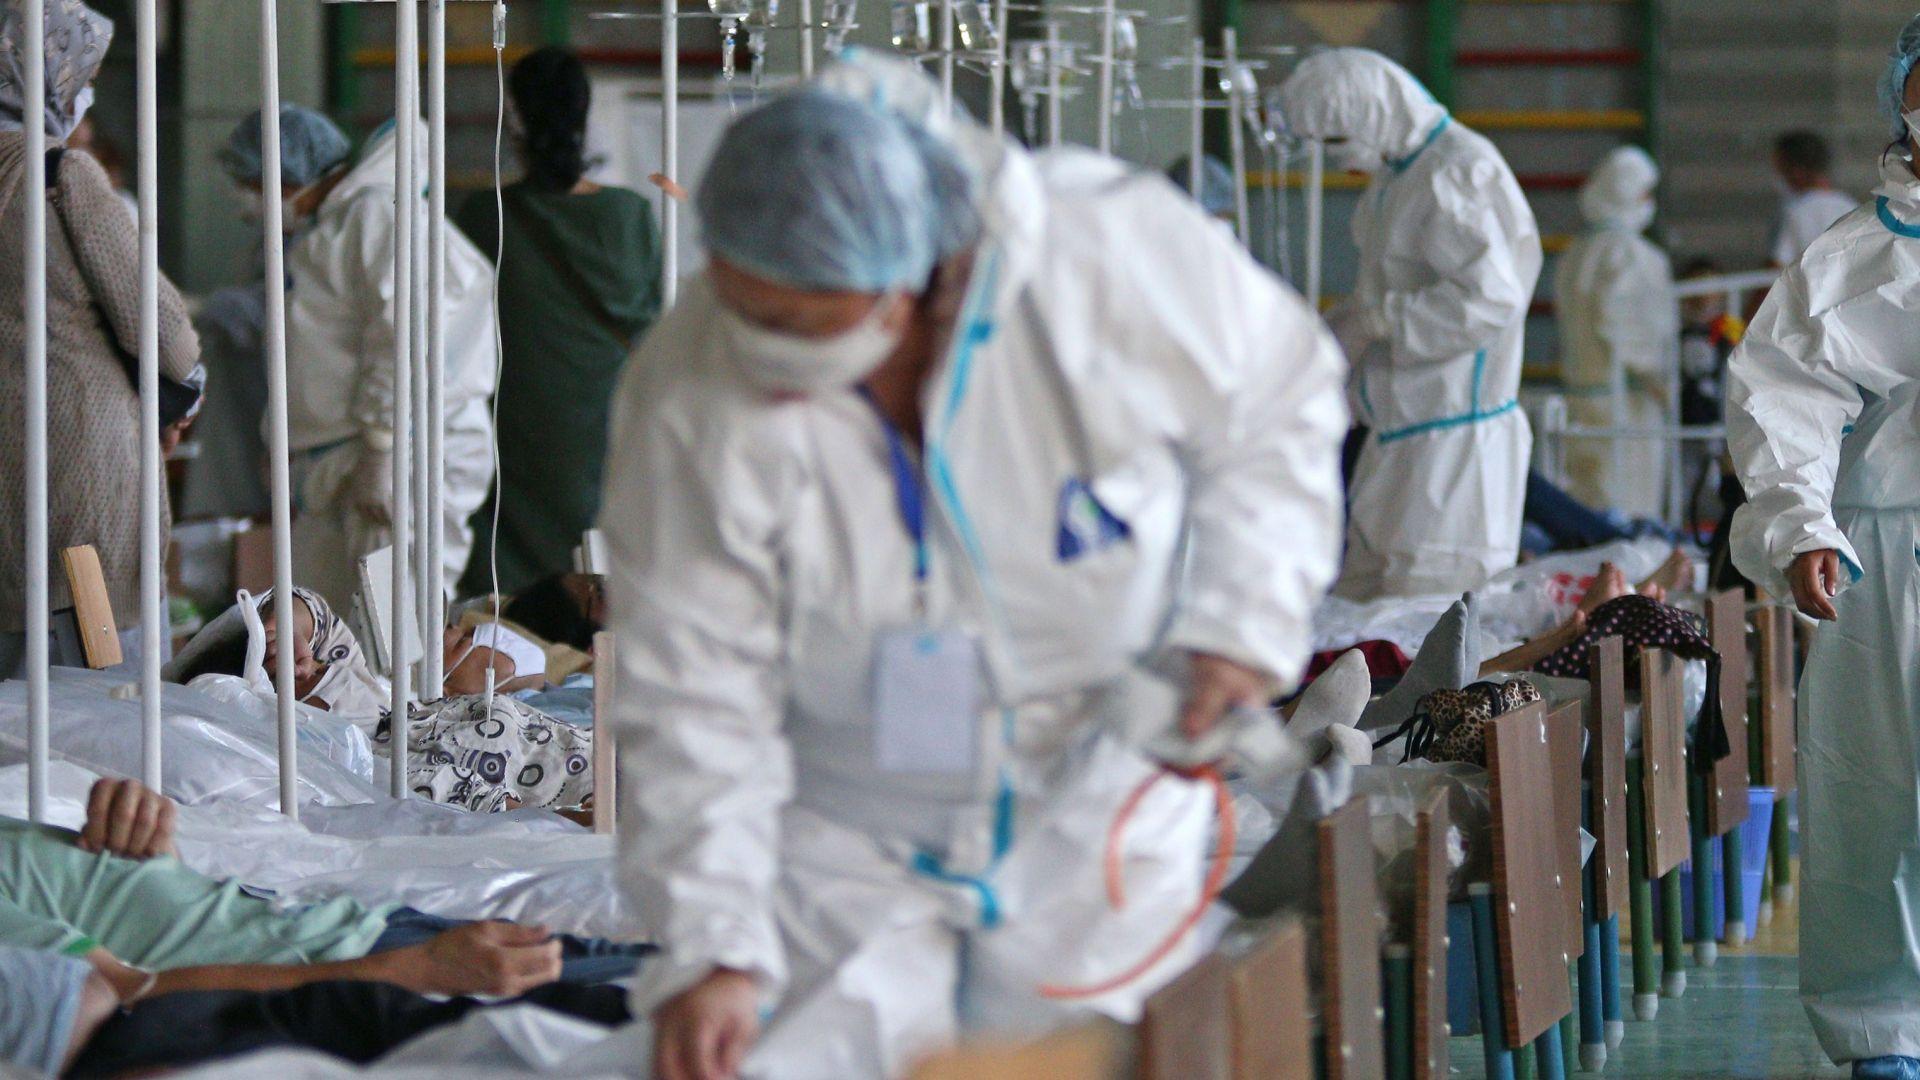 10 смъртни случая и 909 инфекции с коронавирус за последното денонощие